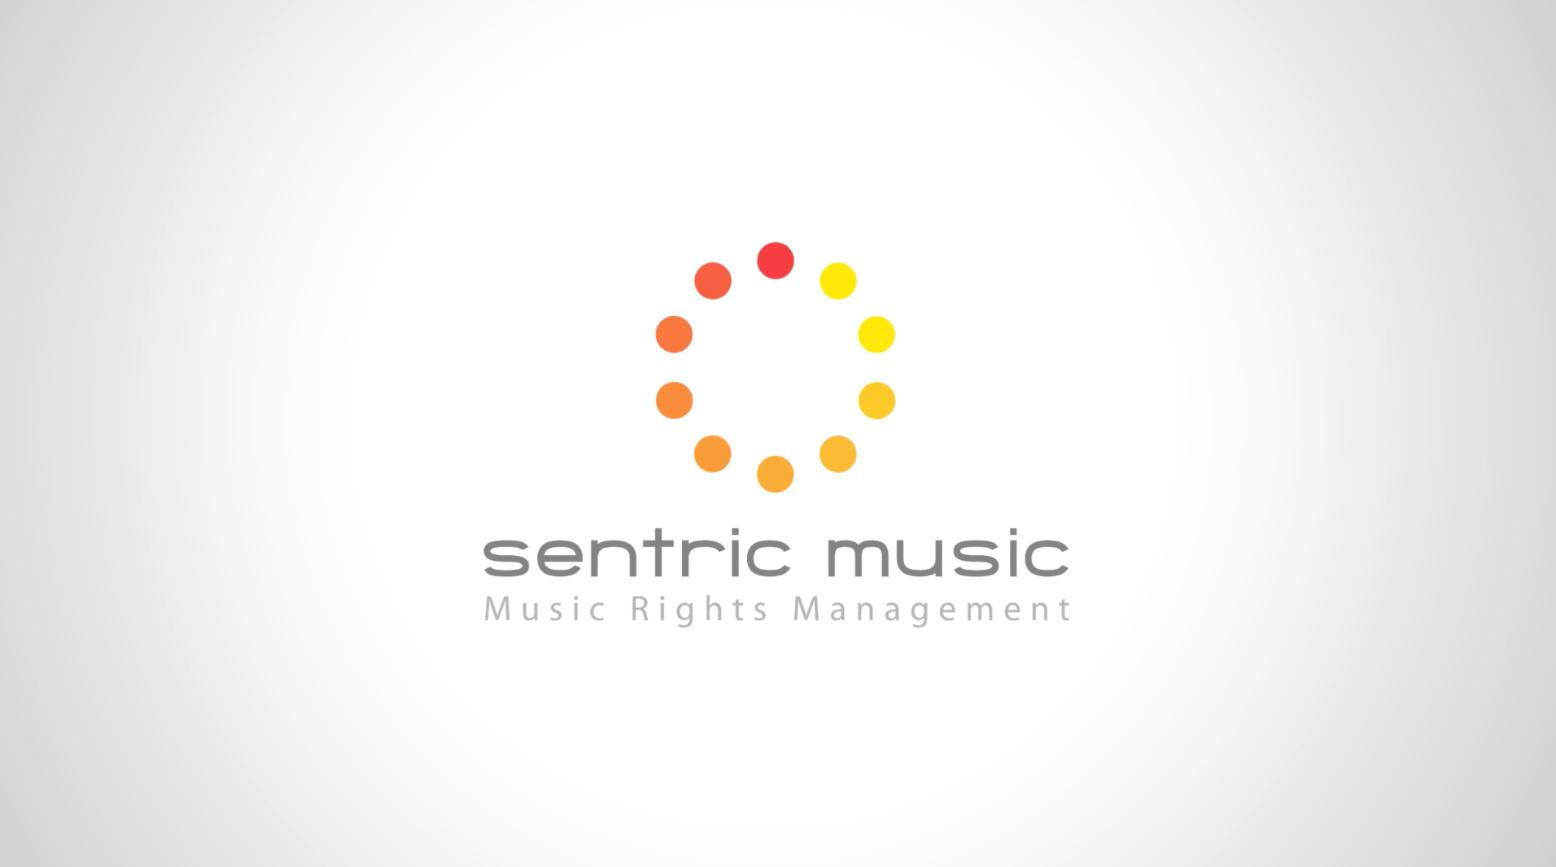 SENTRIC MUSIC 2